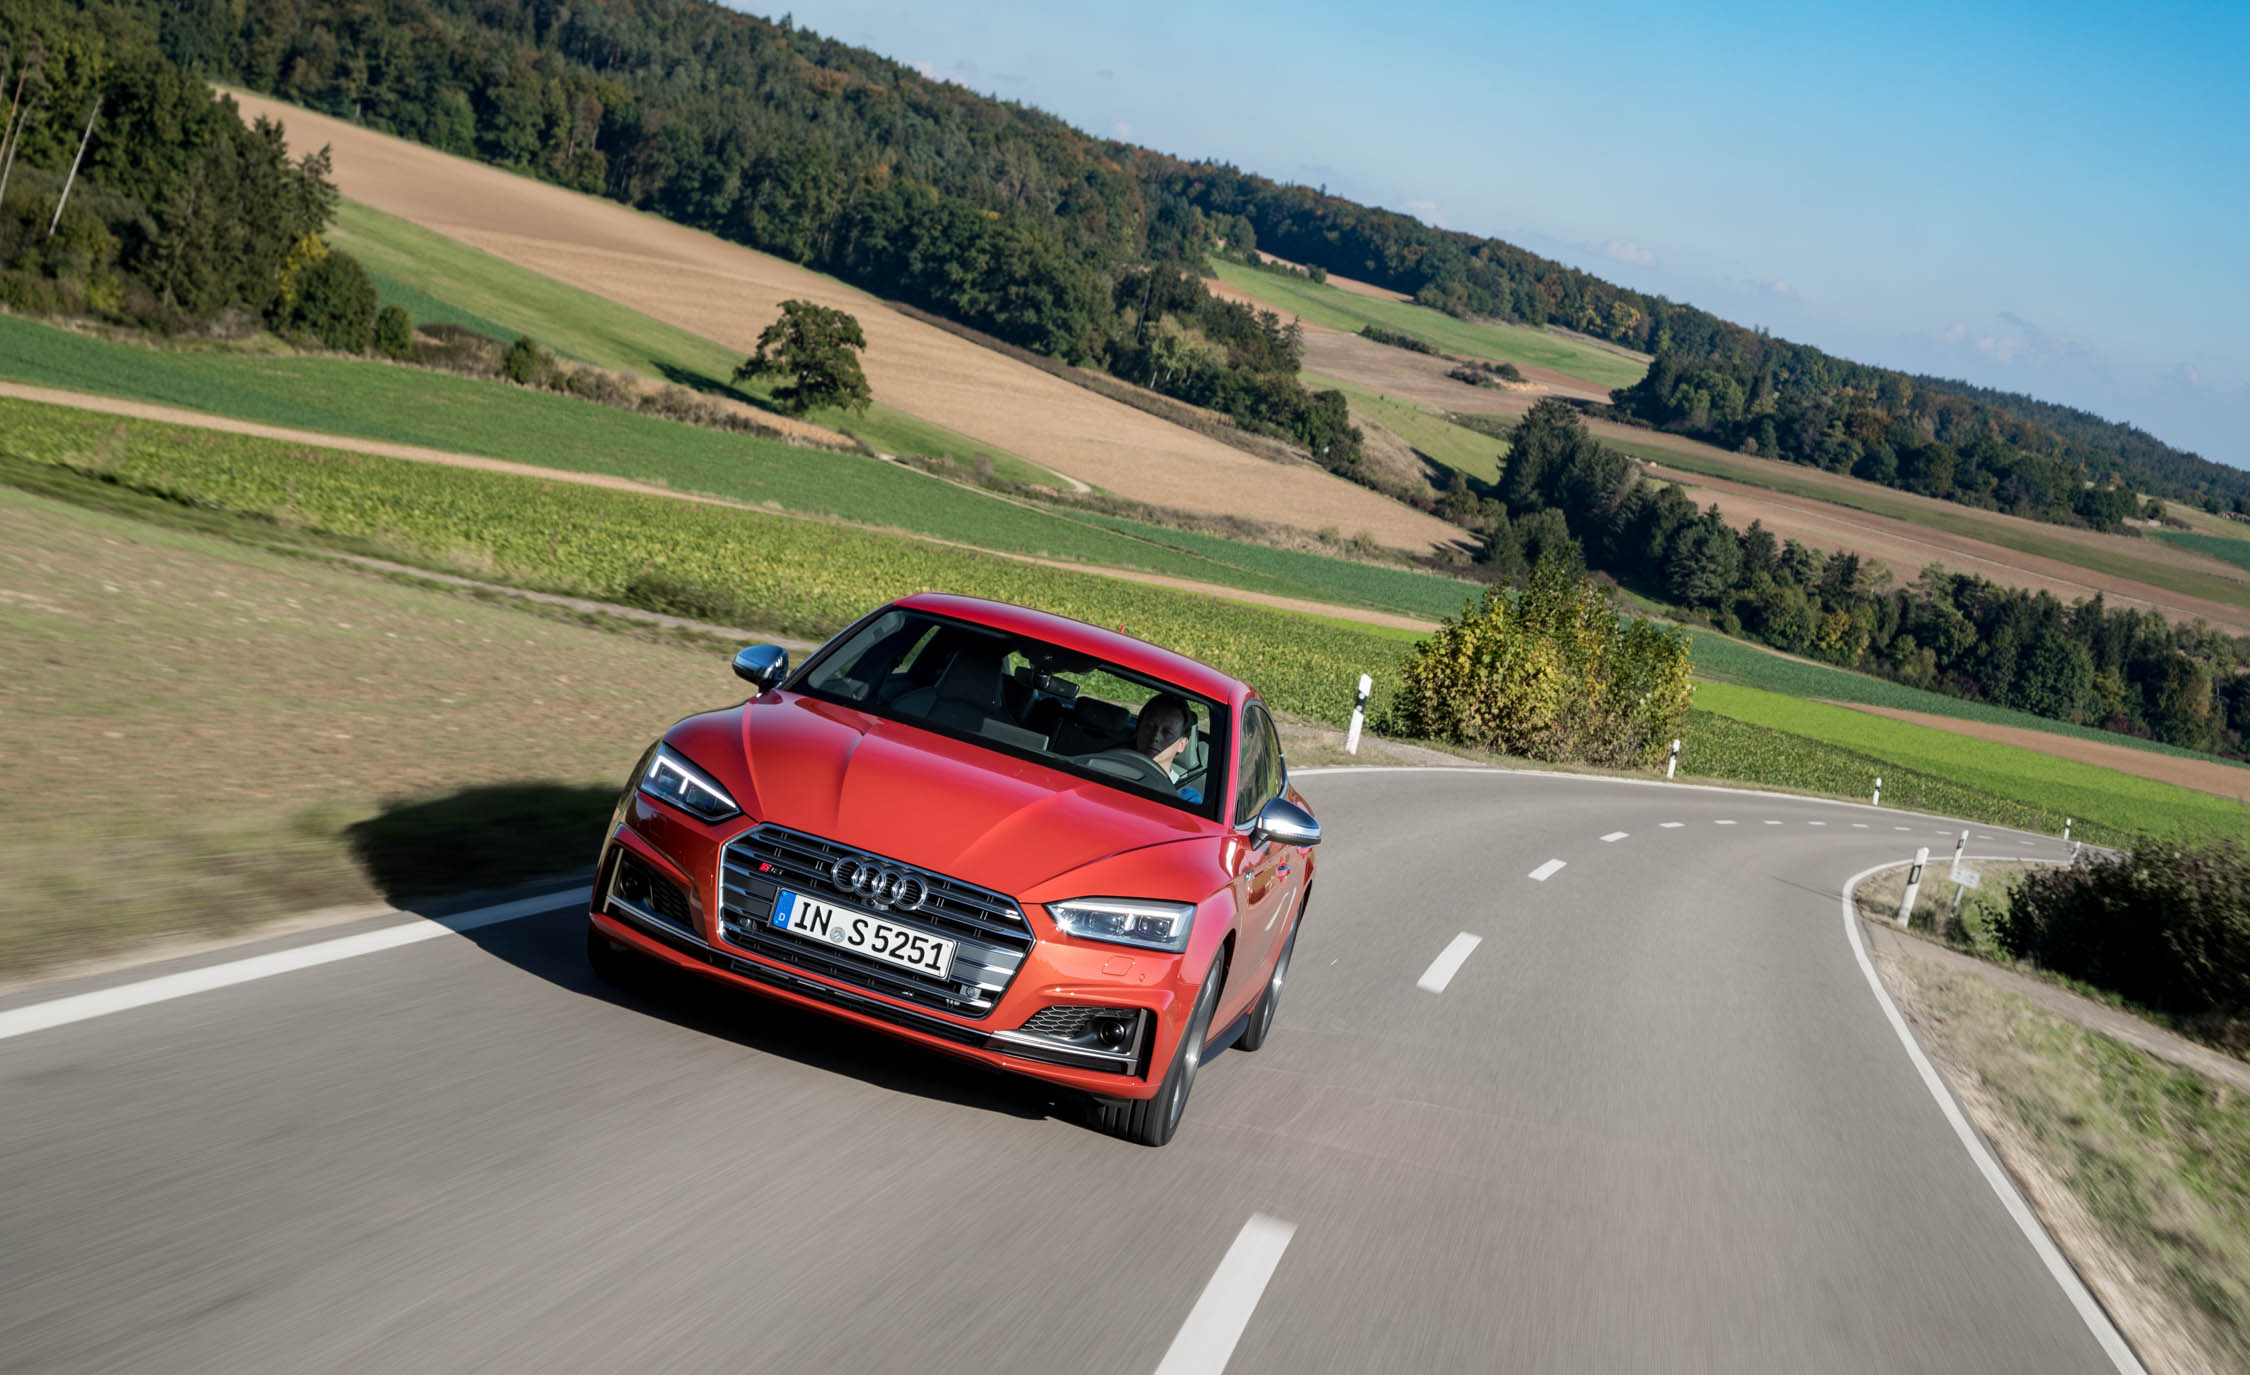 2017 Audi S5 Sportback (View 5 of 10)